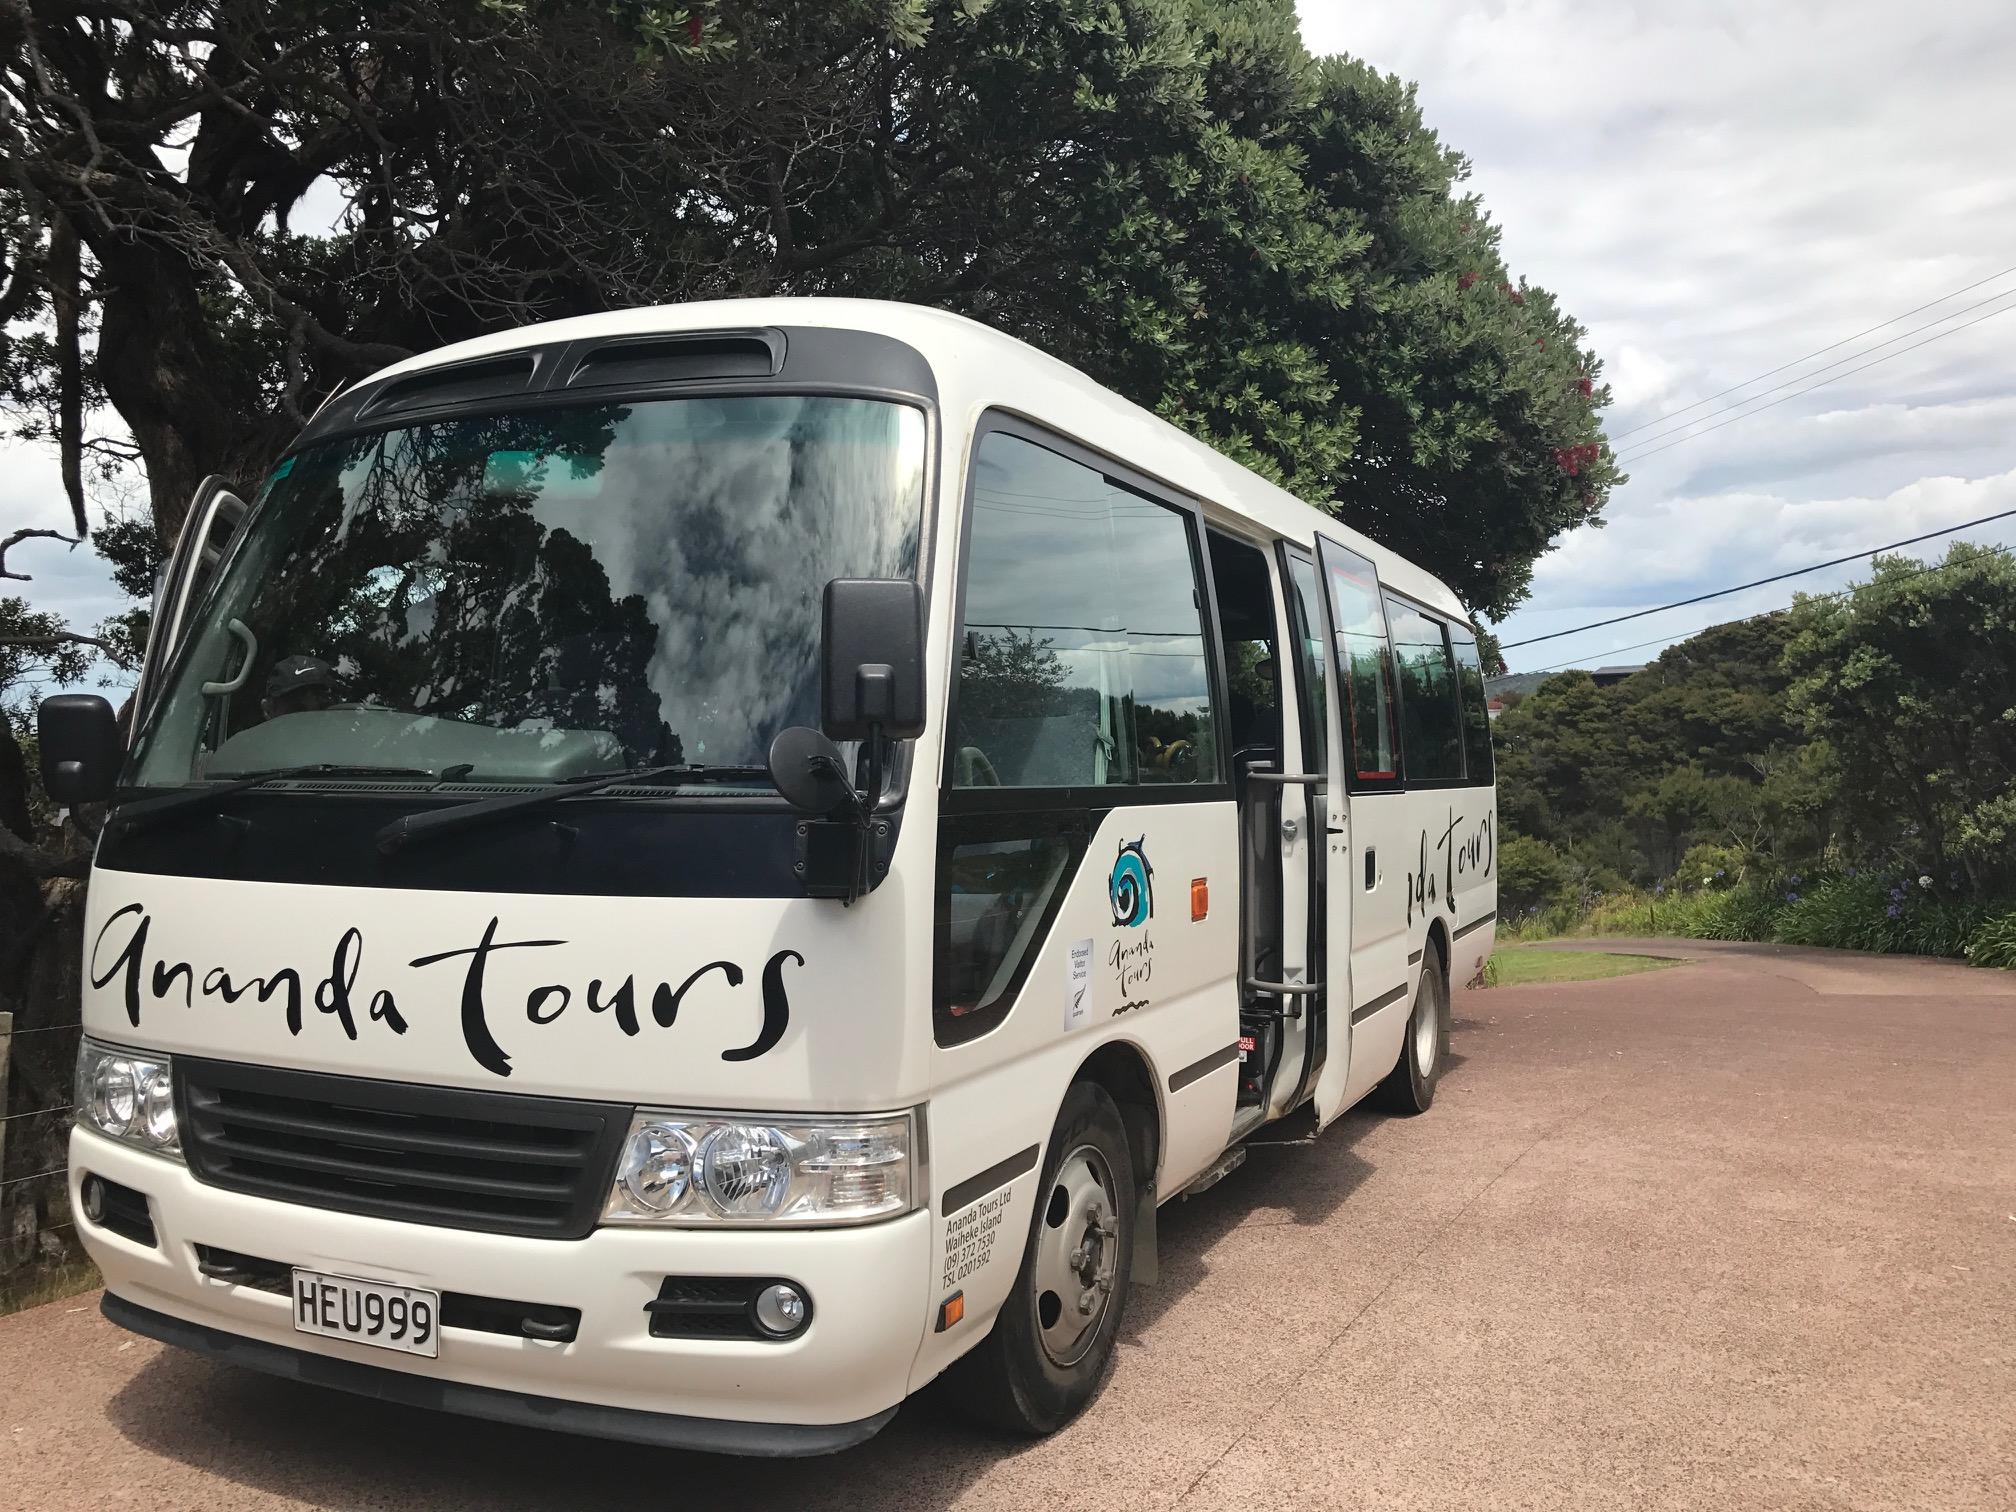 Vineyard tour on Waiheke Island with Ananda